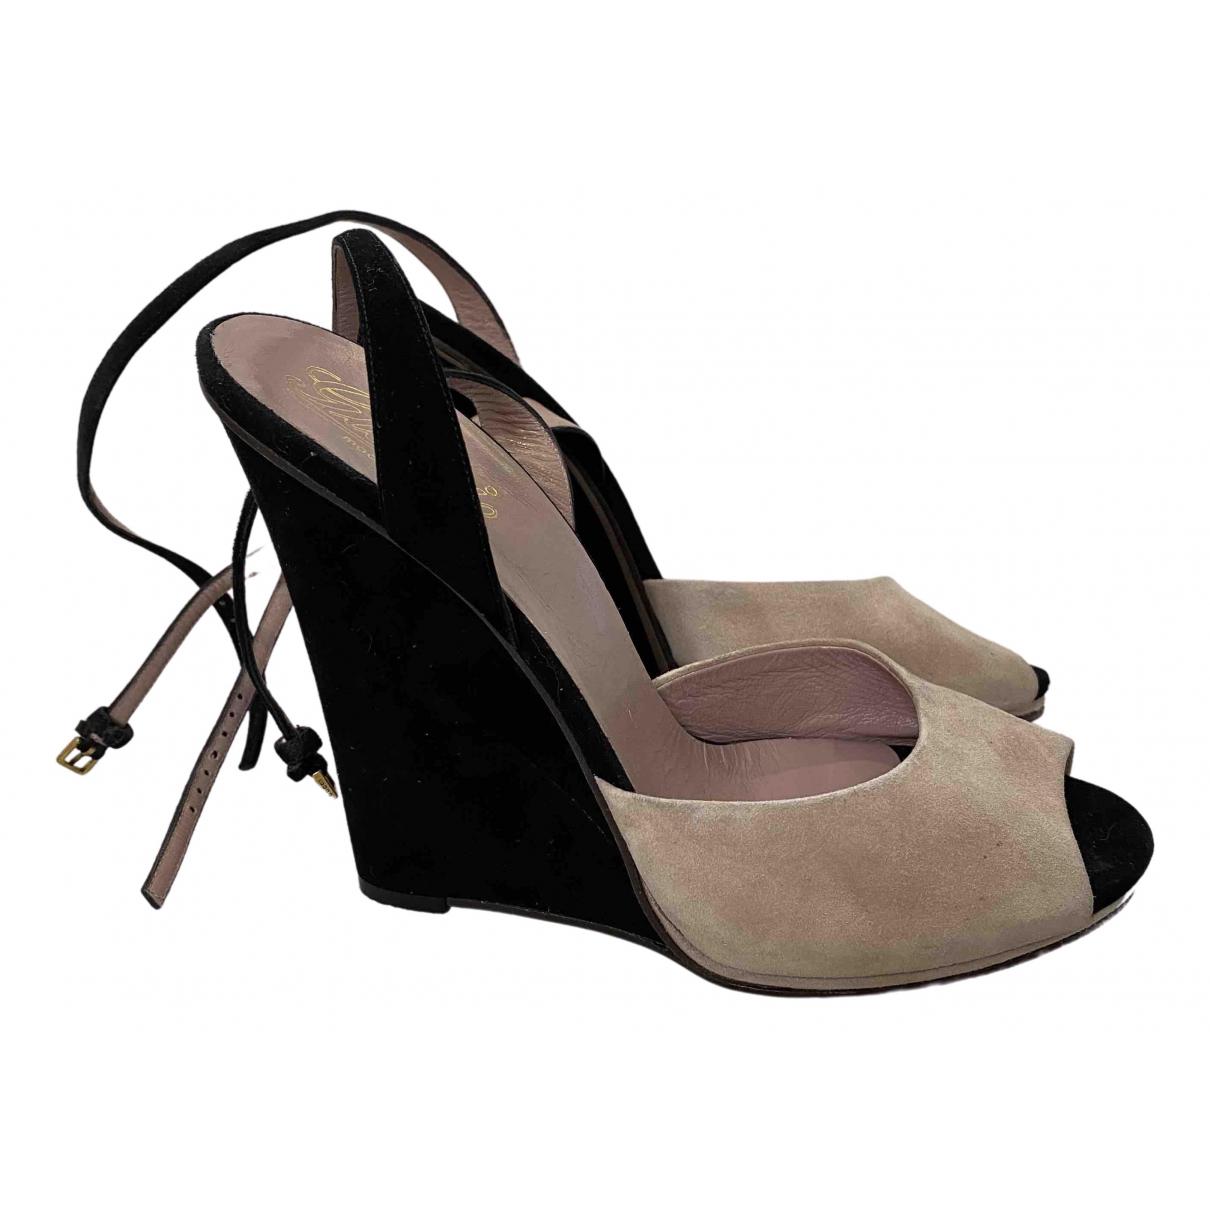 Gucci \N Beige Suede Sandals for Women 40 EU